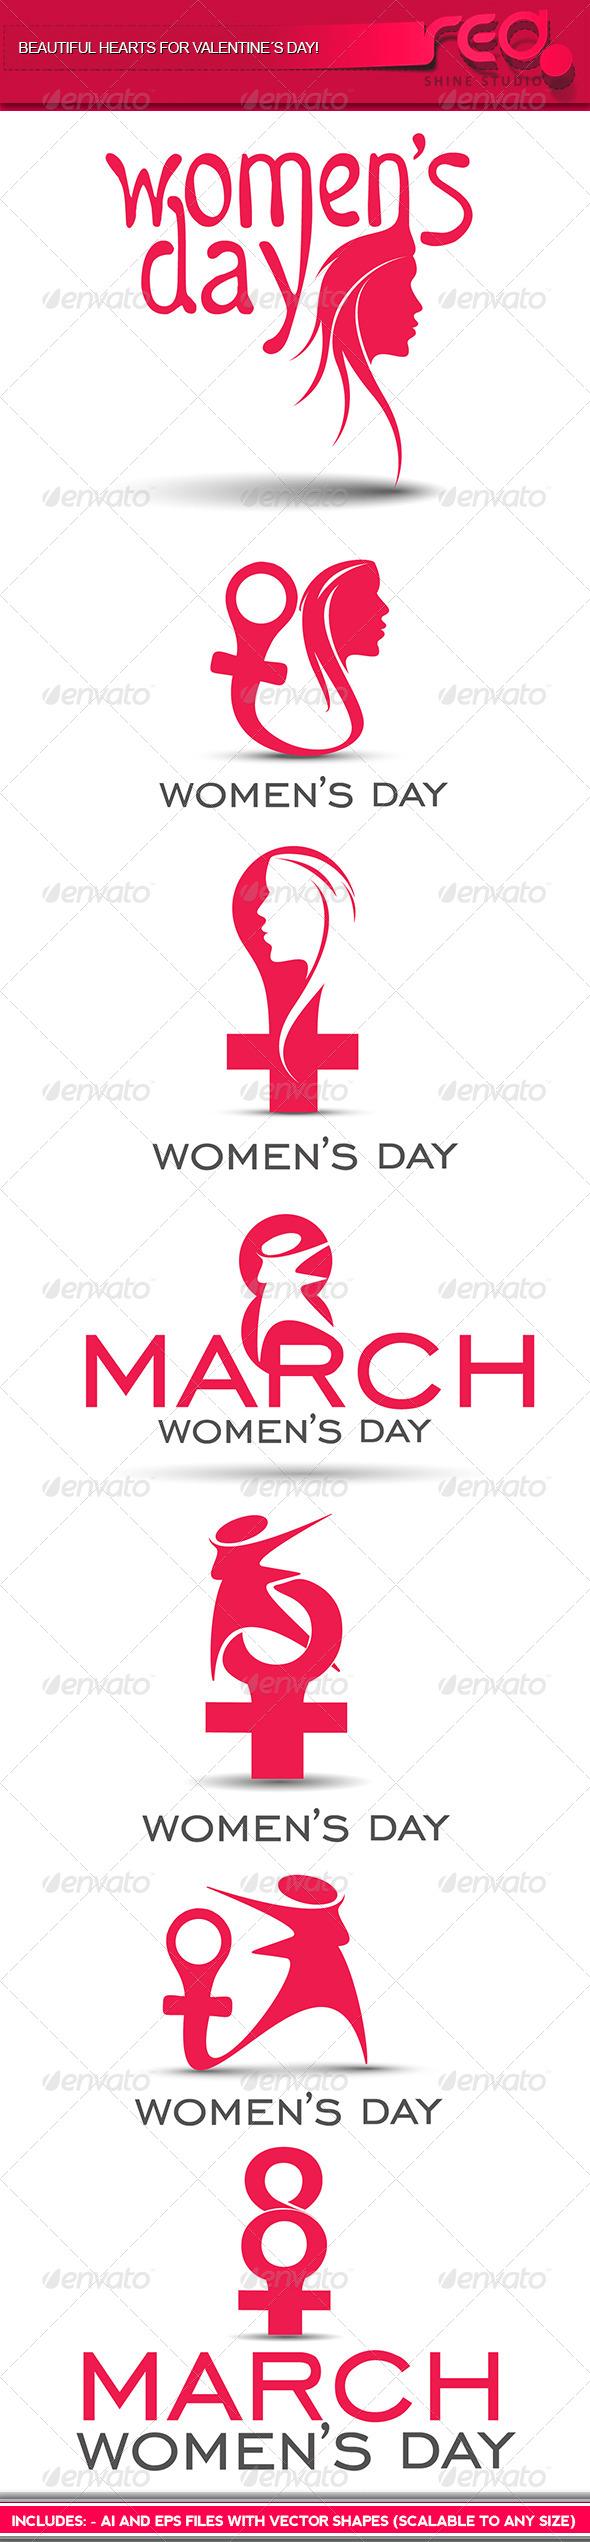 GraphicRiver Woman s Day Icon 6903277